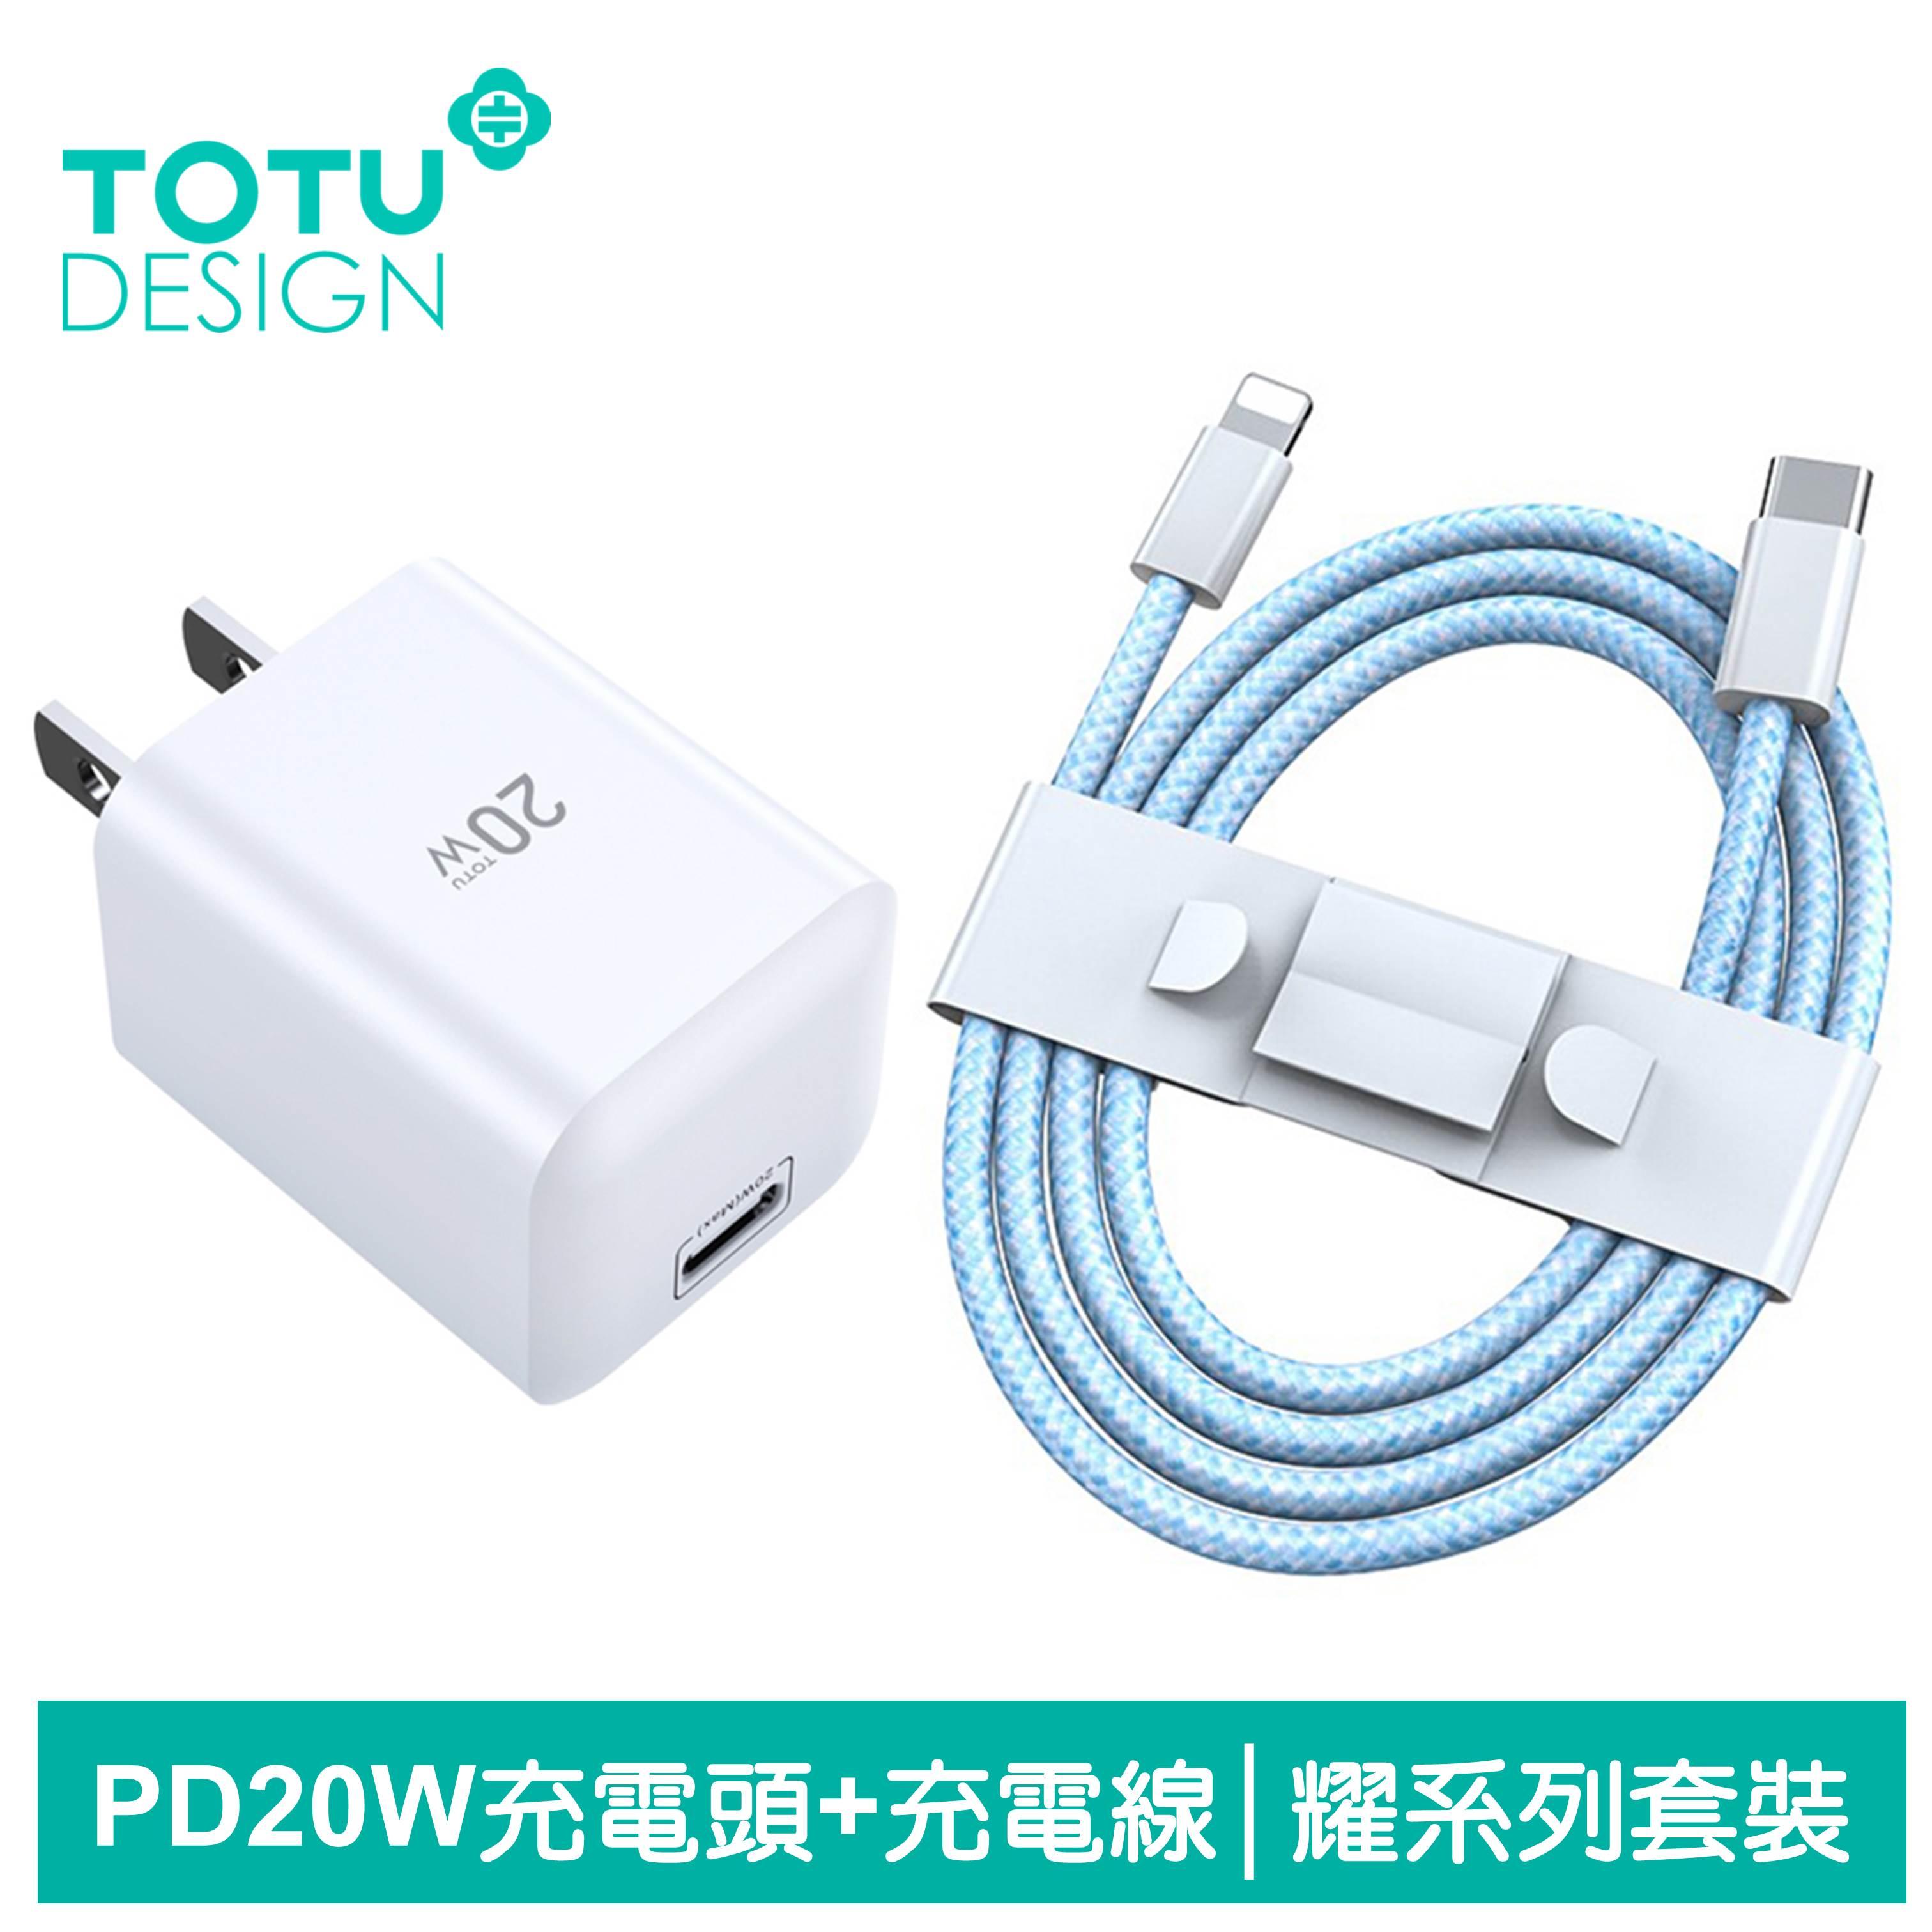 TOTU台灣官方 PD/iPhone充電線充電器充電頭傳輸線快充線快充頭 20W 耀彩套裝 白色頭+藍色線